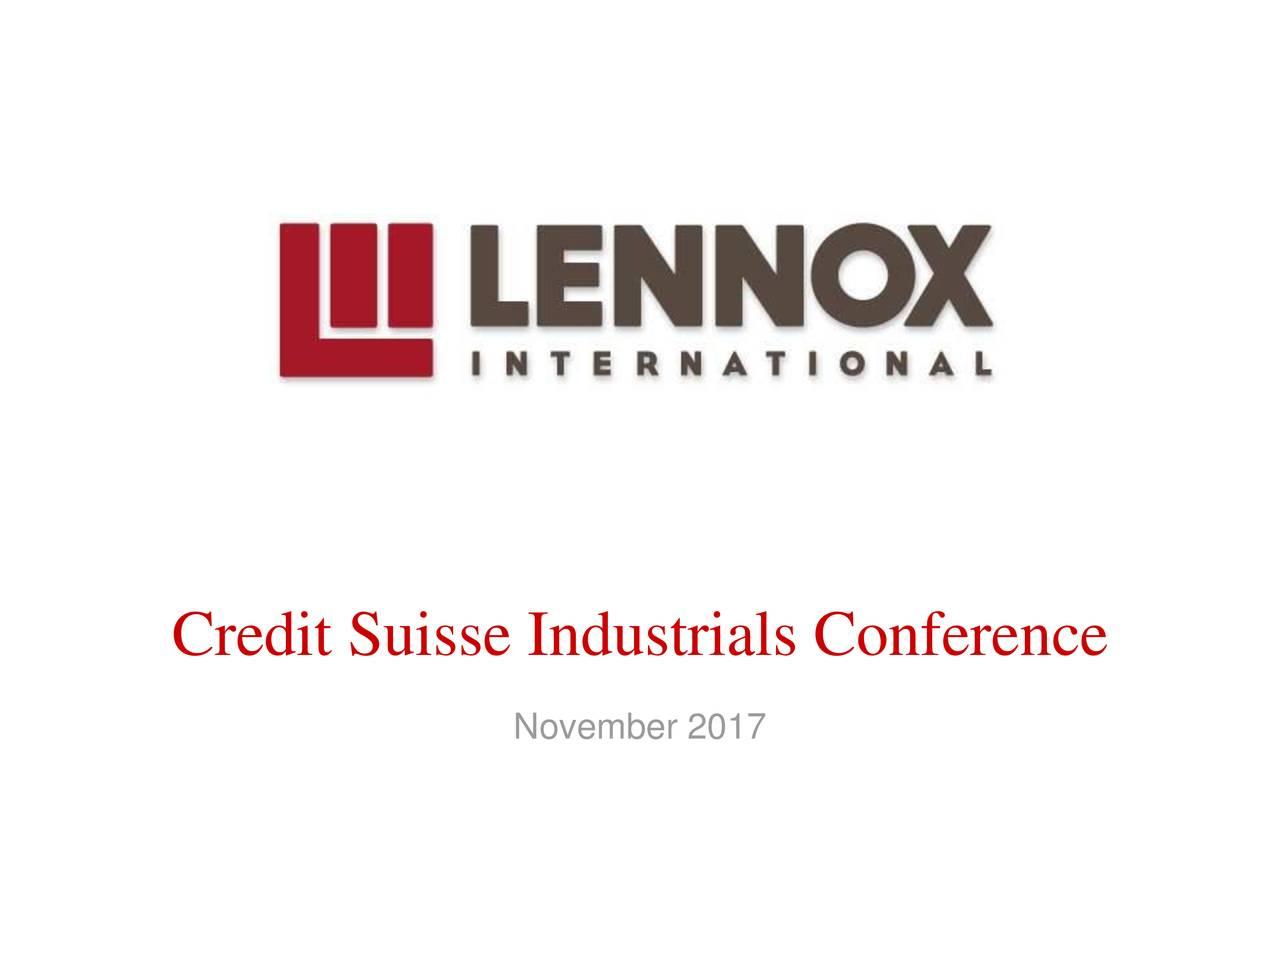 Credit Suisse Industrials Conference